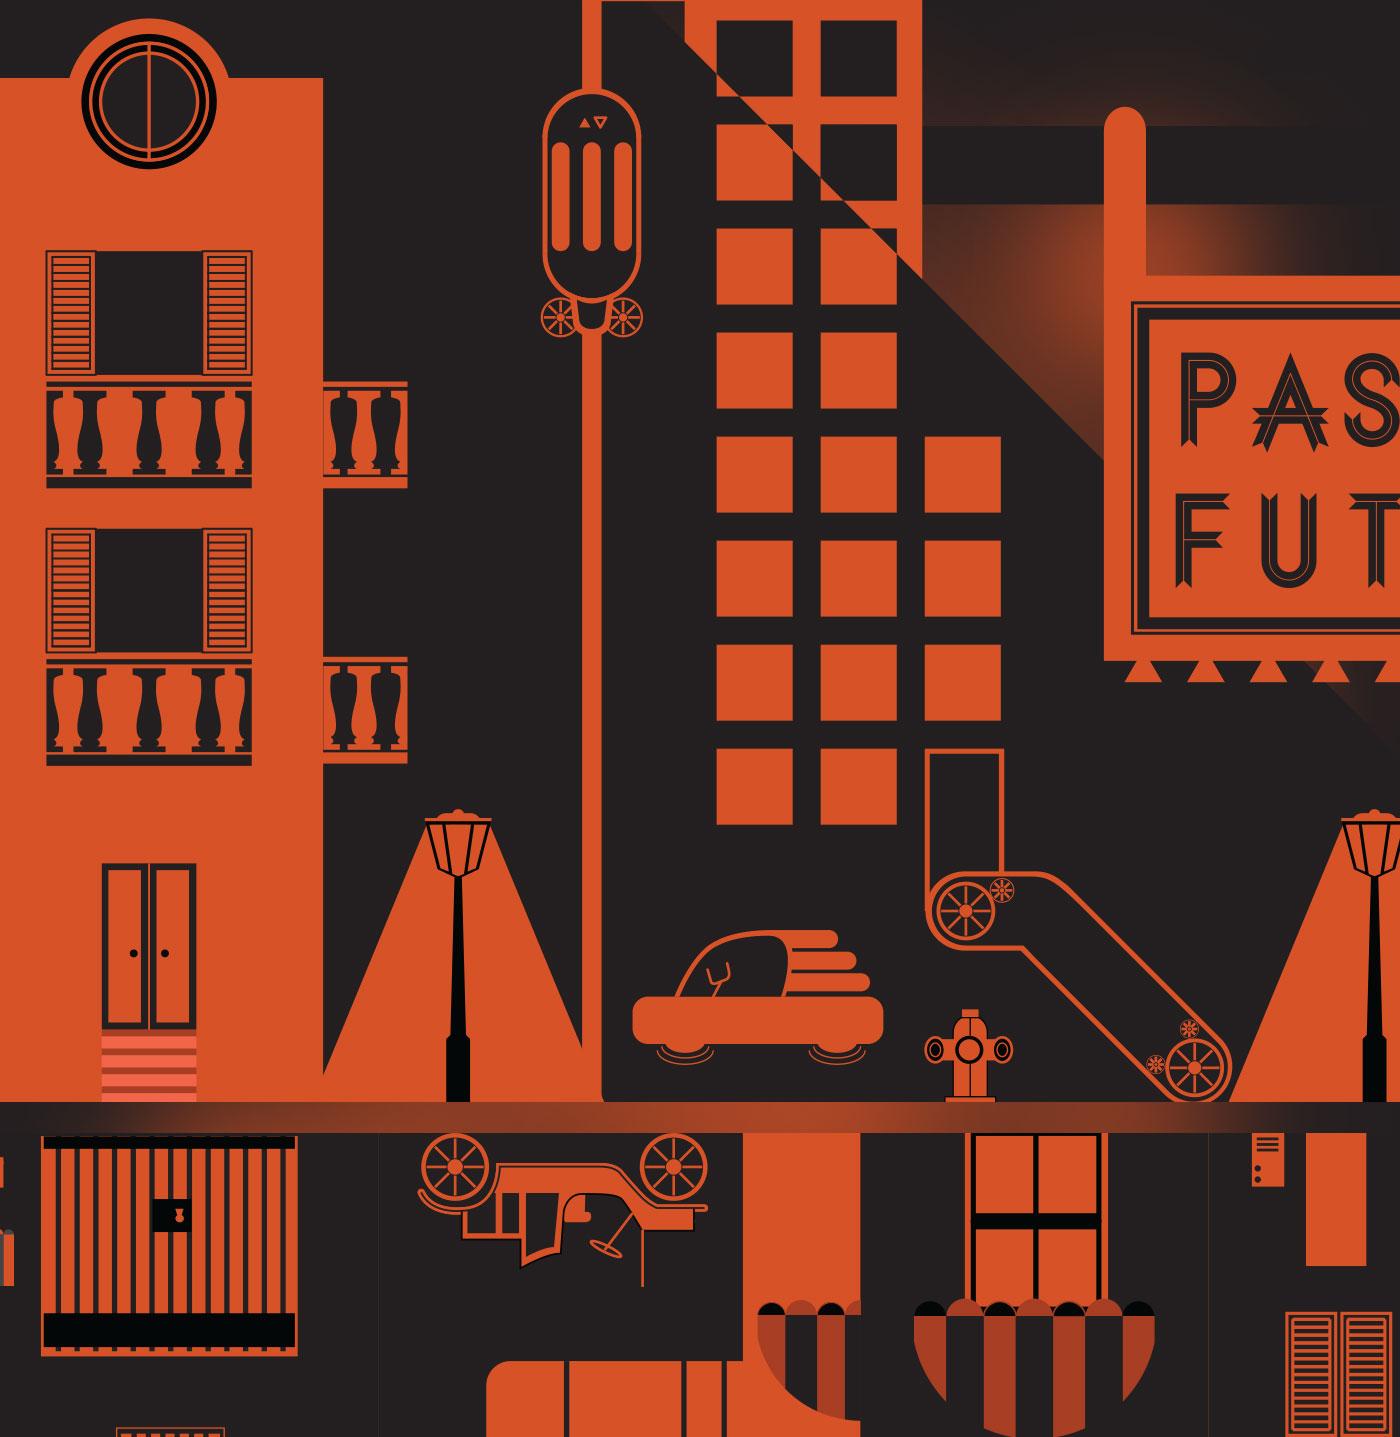 3 past future grafico milano chaubet vectorial art